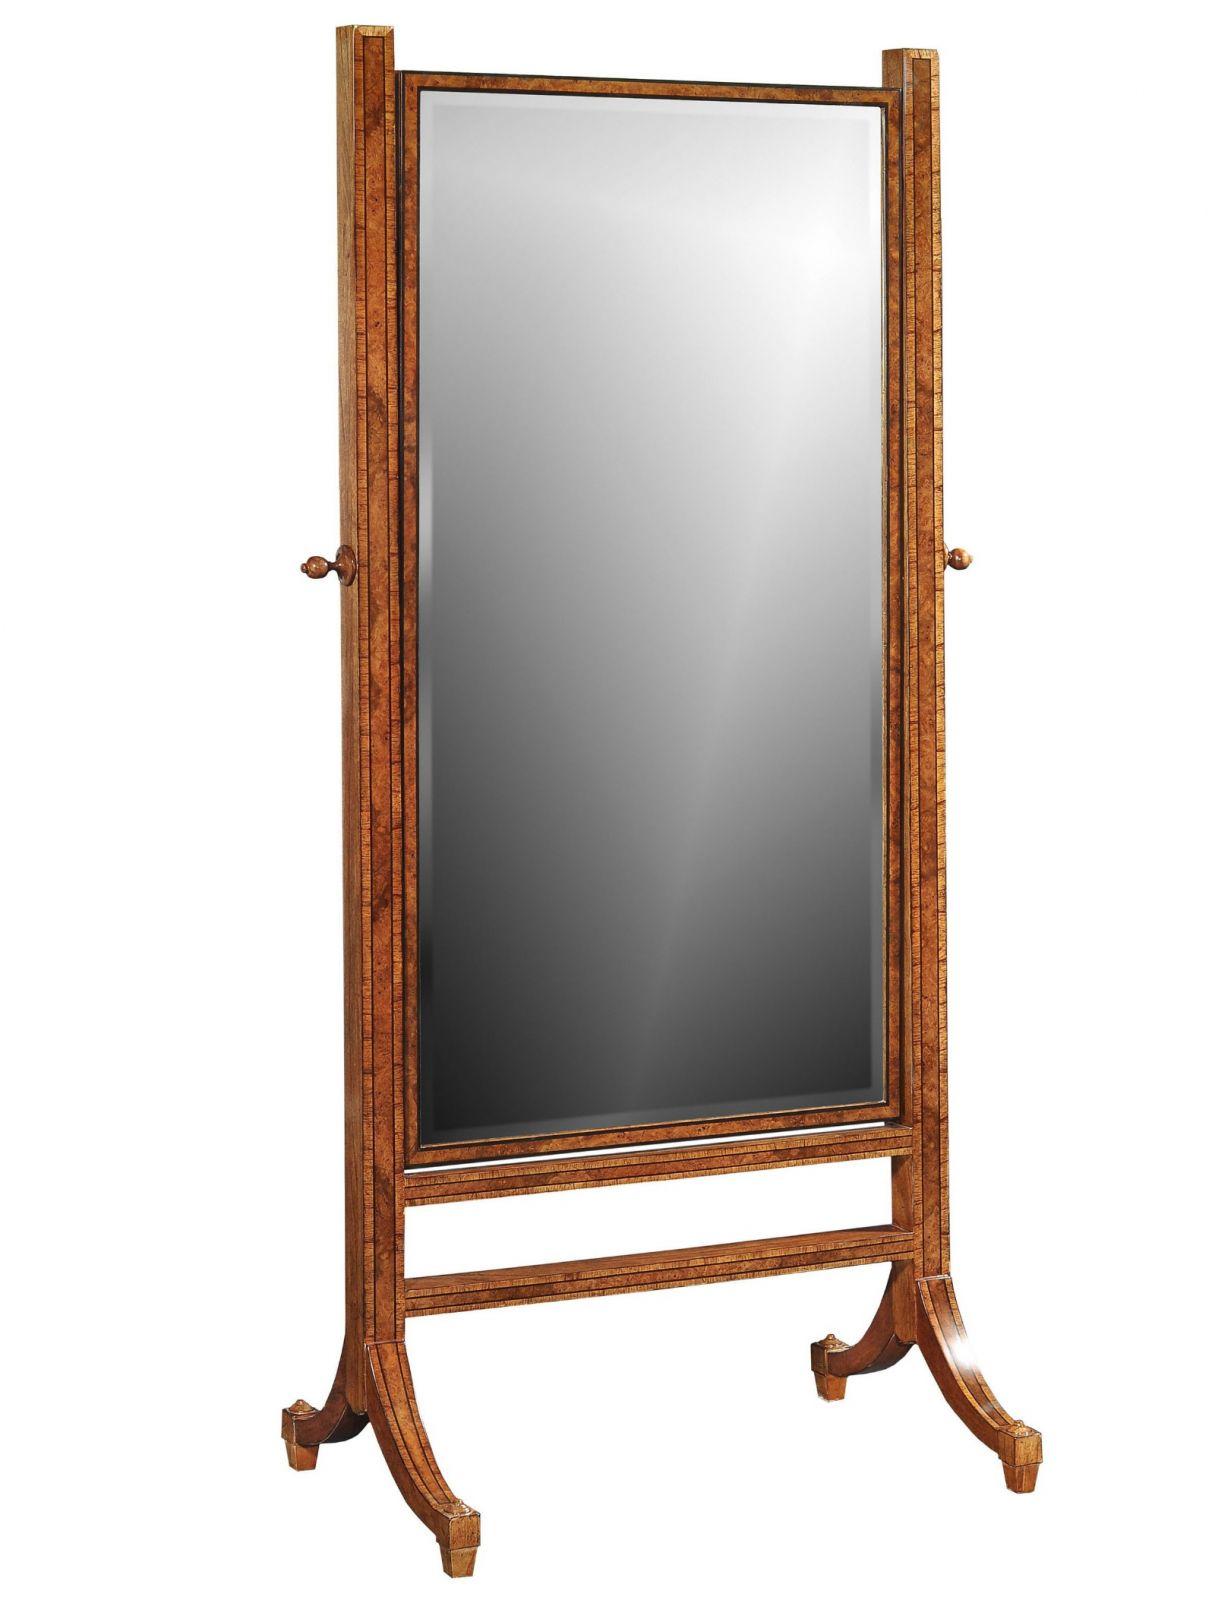 Dorchester cheval mirror